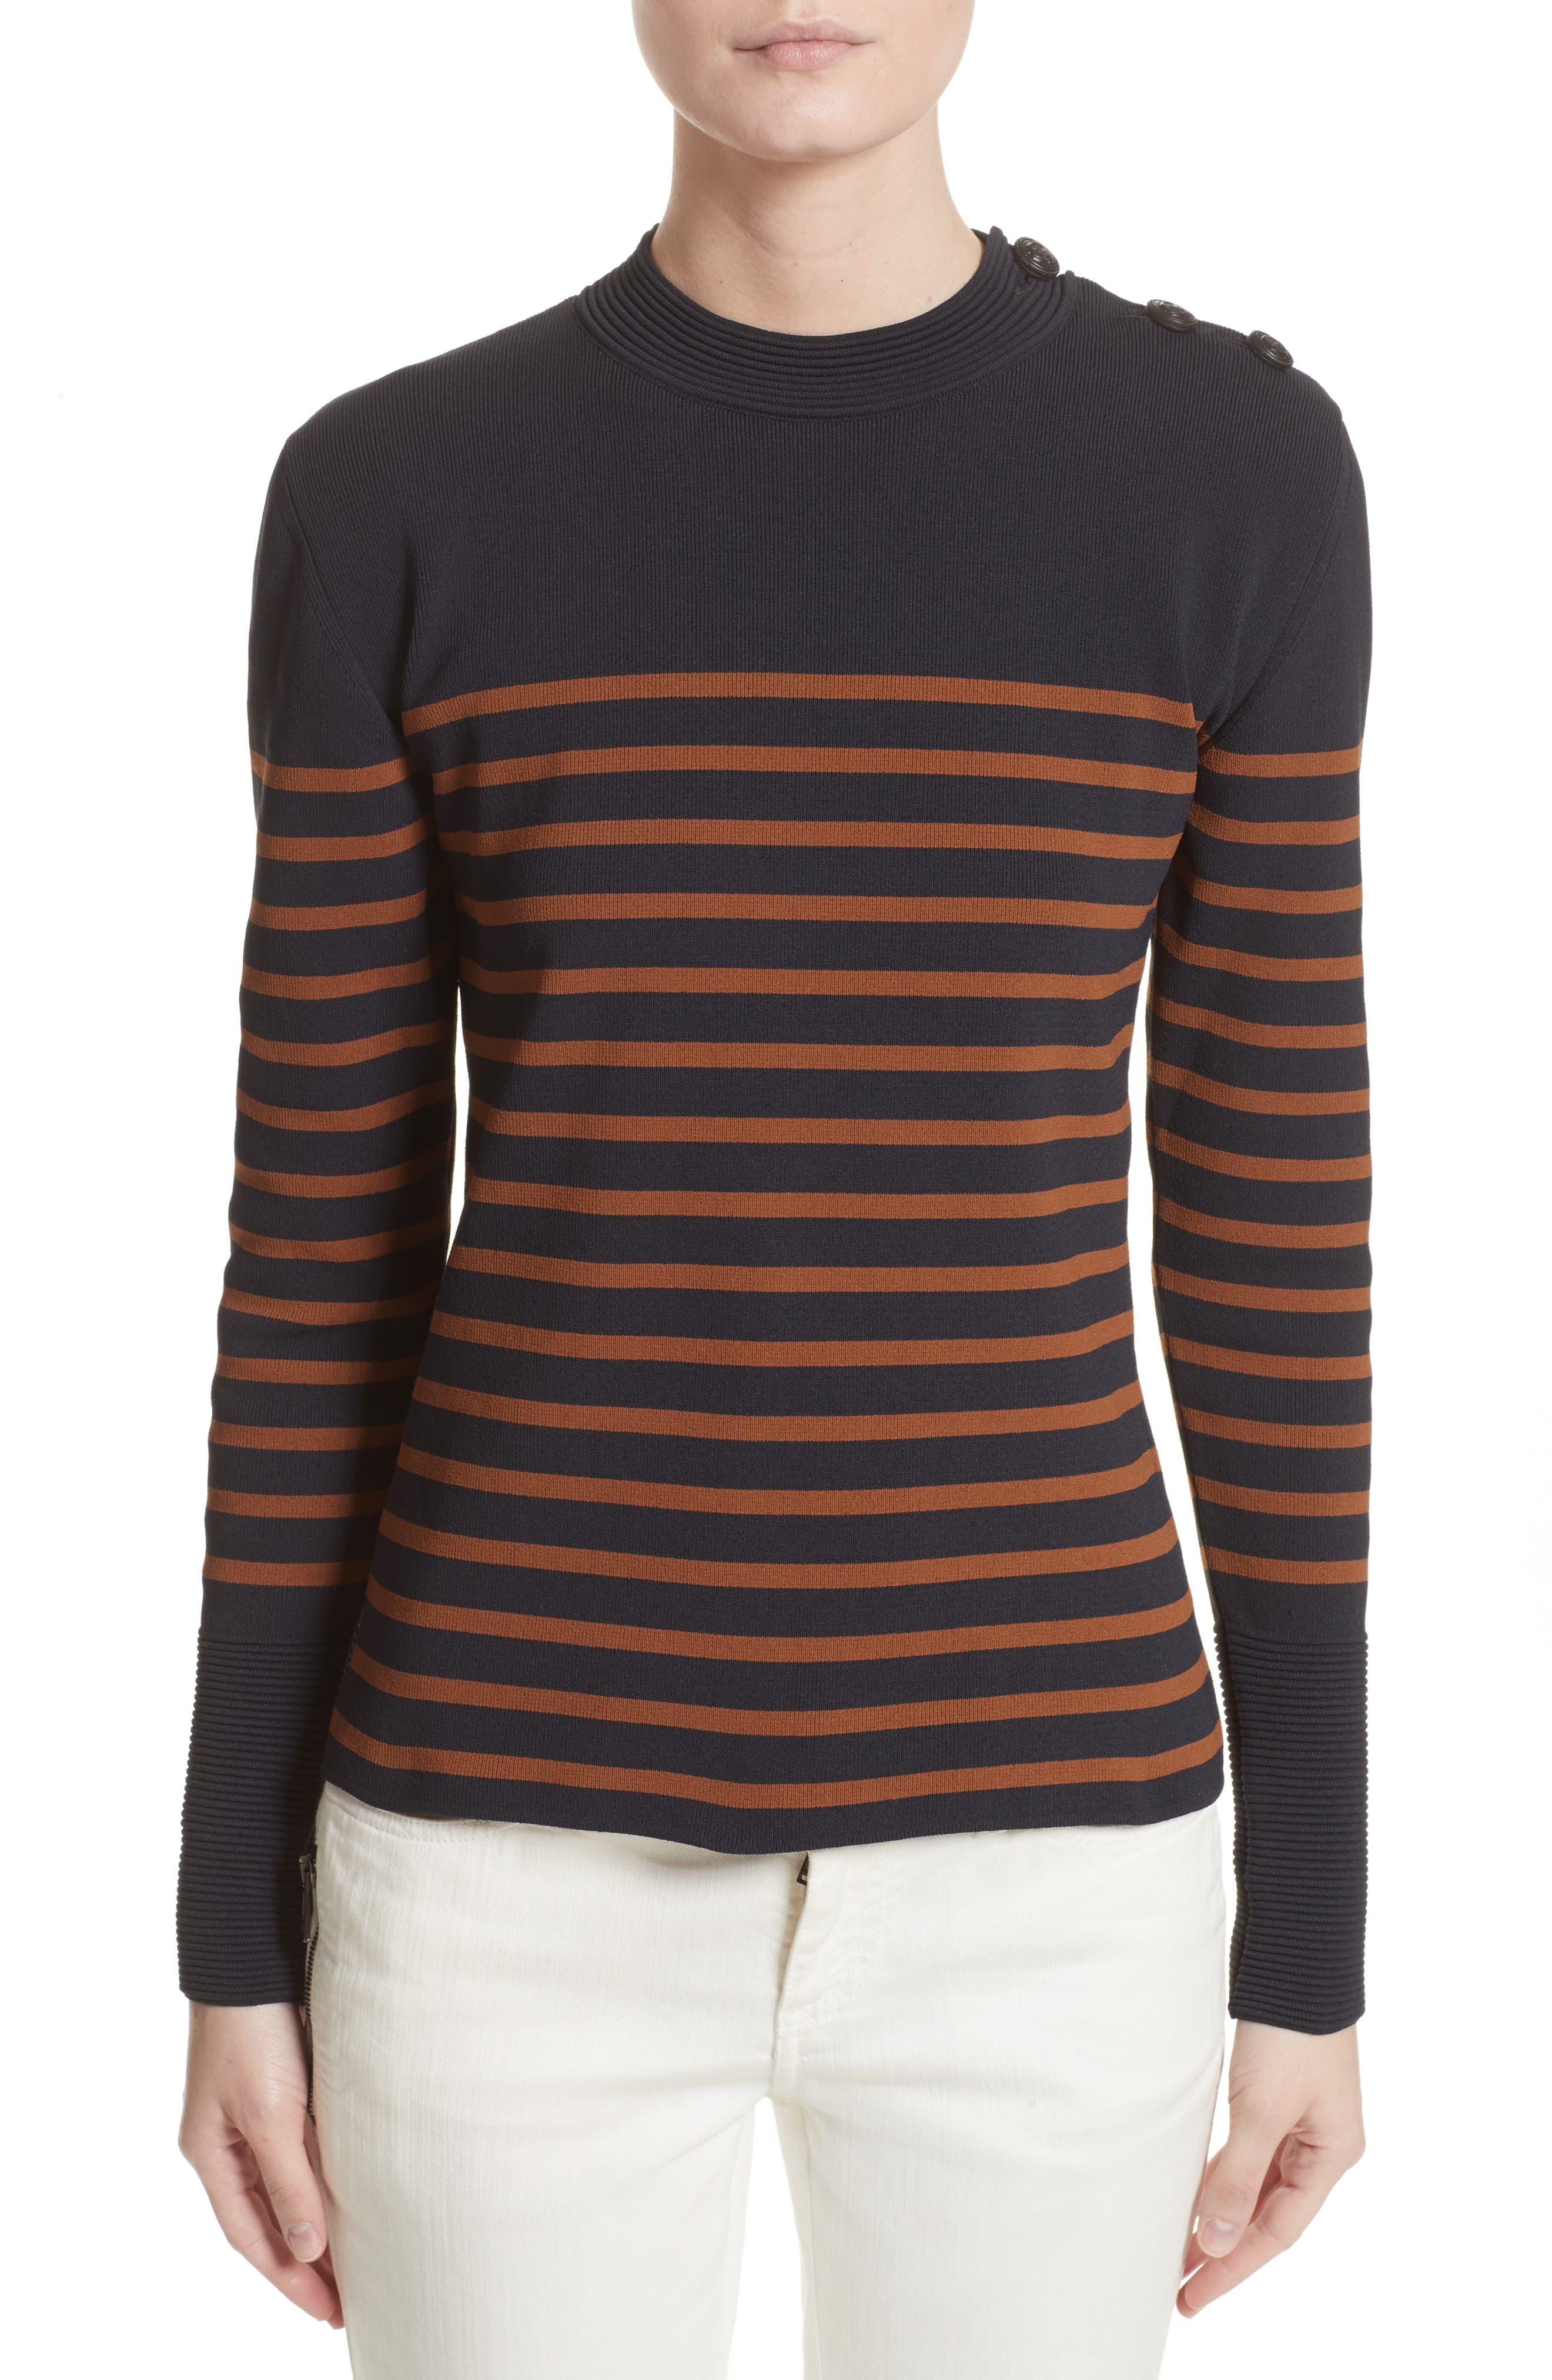 Selicia Stripe Sweater,                             Main thumbnail 1, color,                             Black